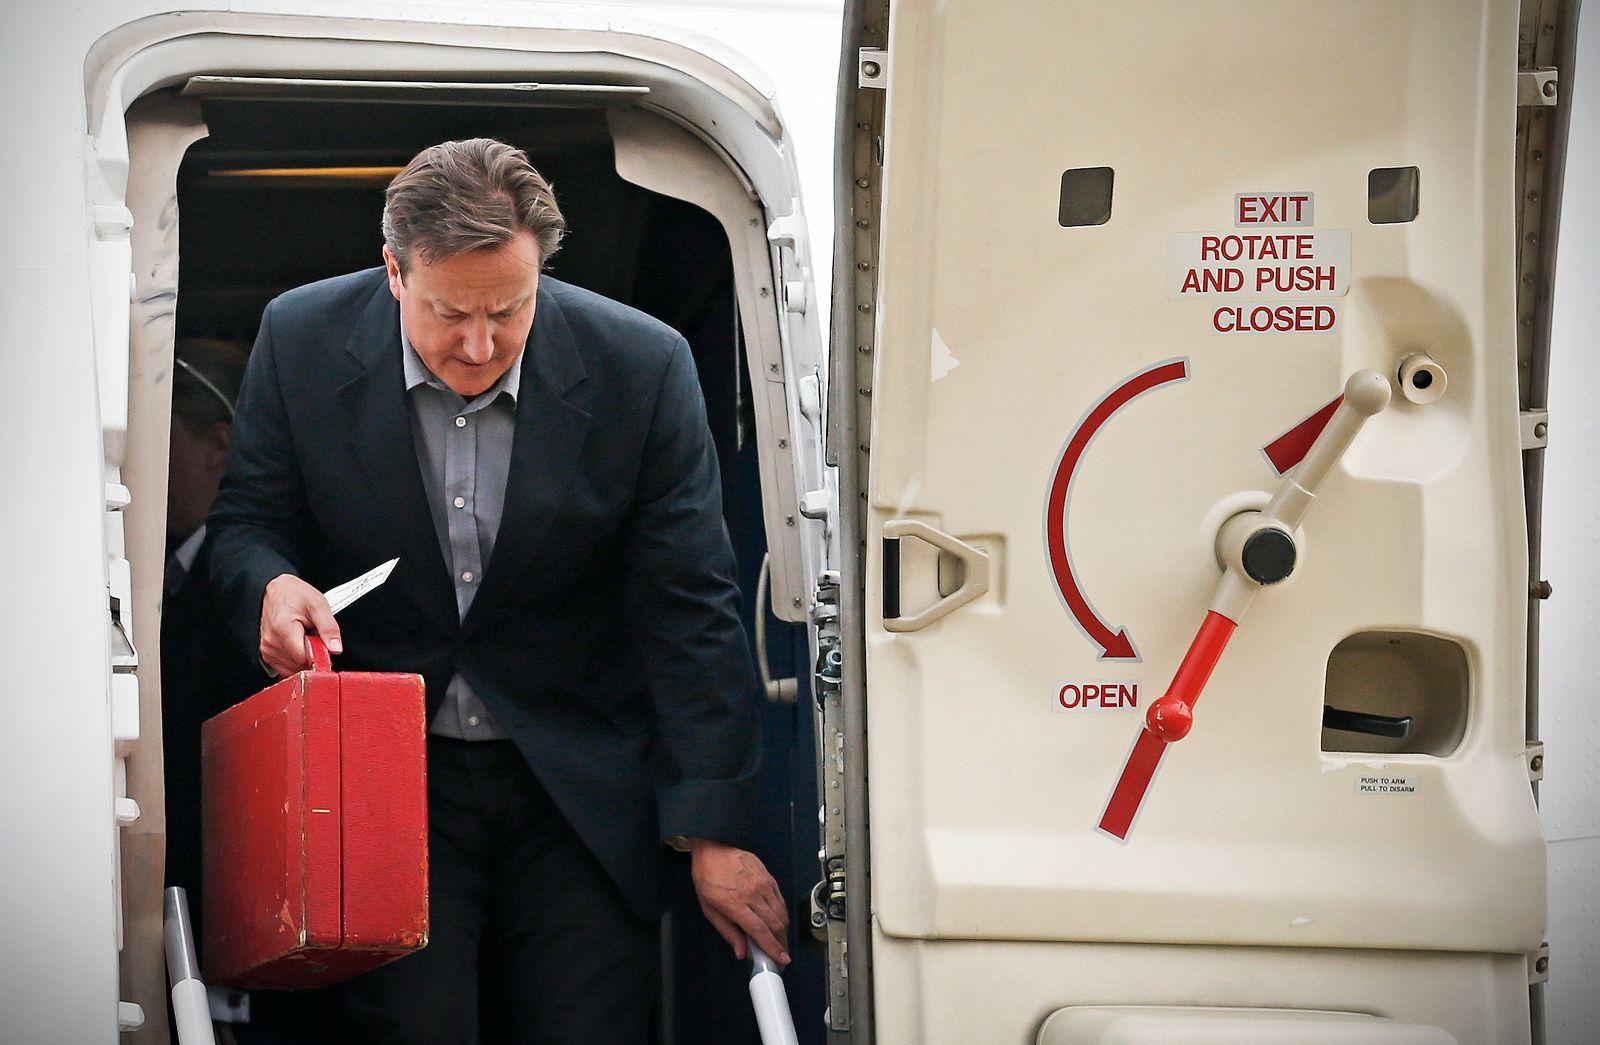 Britain's Prime Minister David Cameron arrives to attend the Enniskillen G8 summit at Belfast International Airport